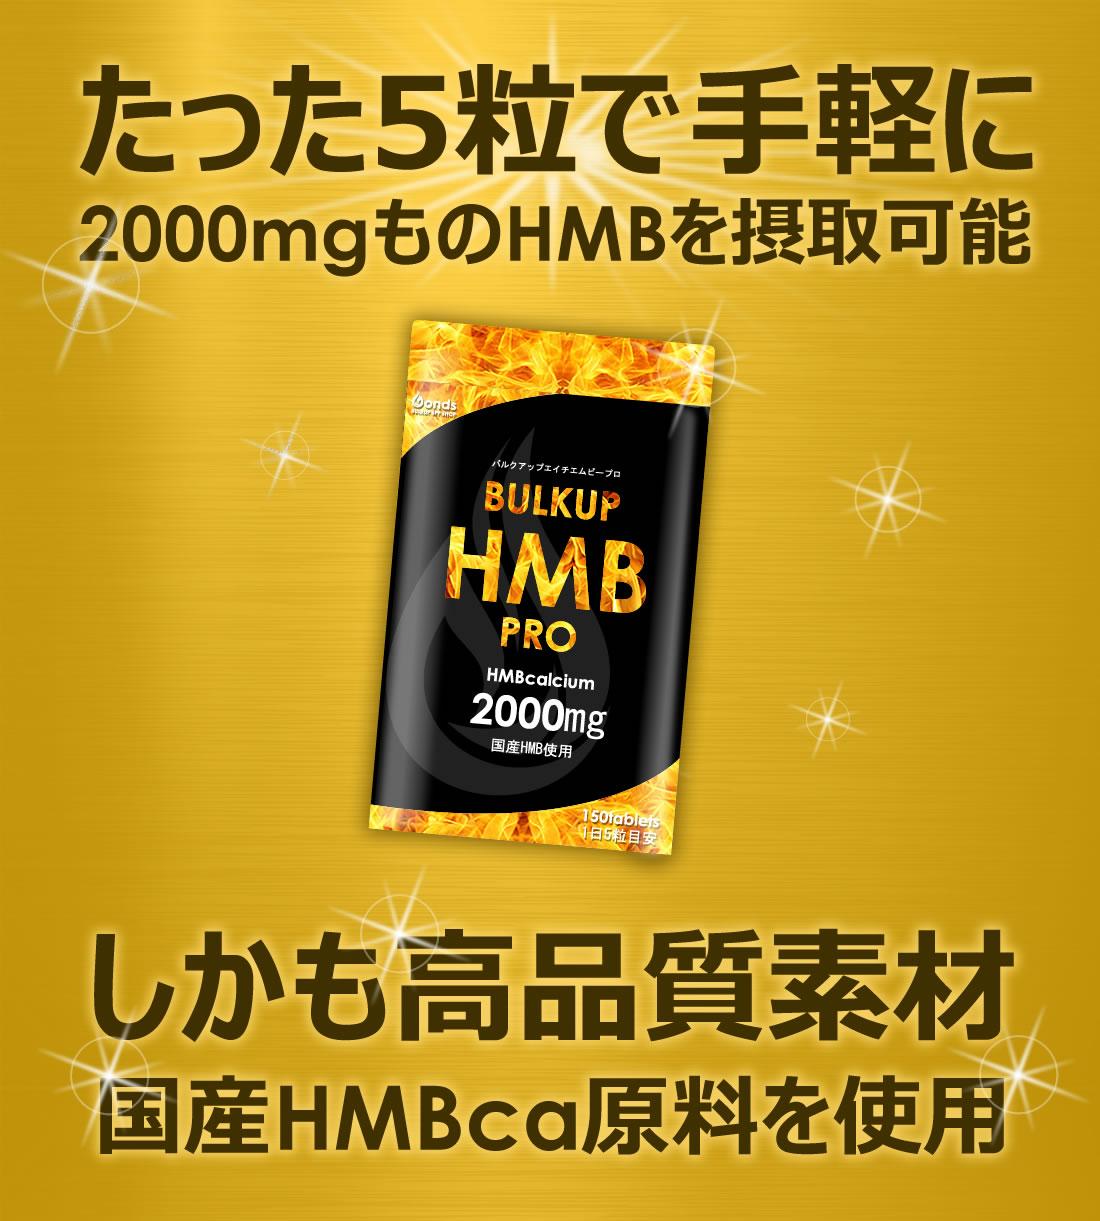 HMB以外の成分